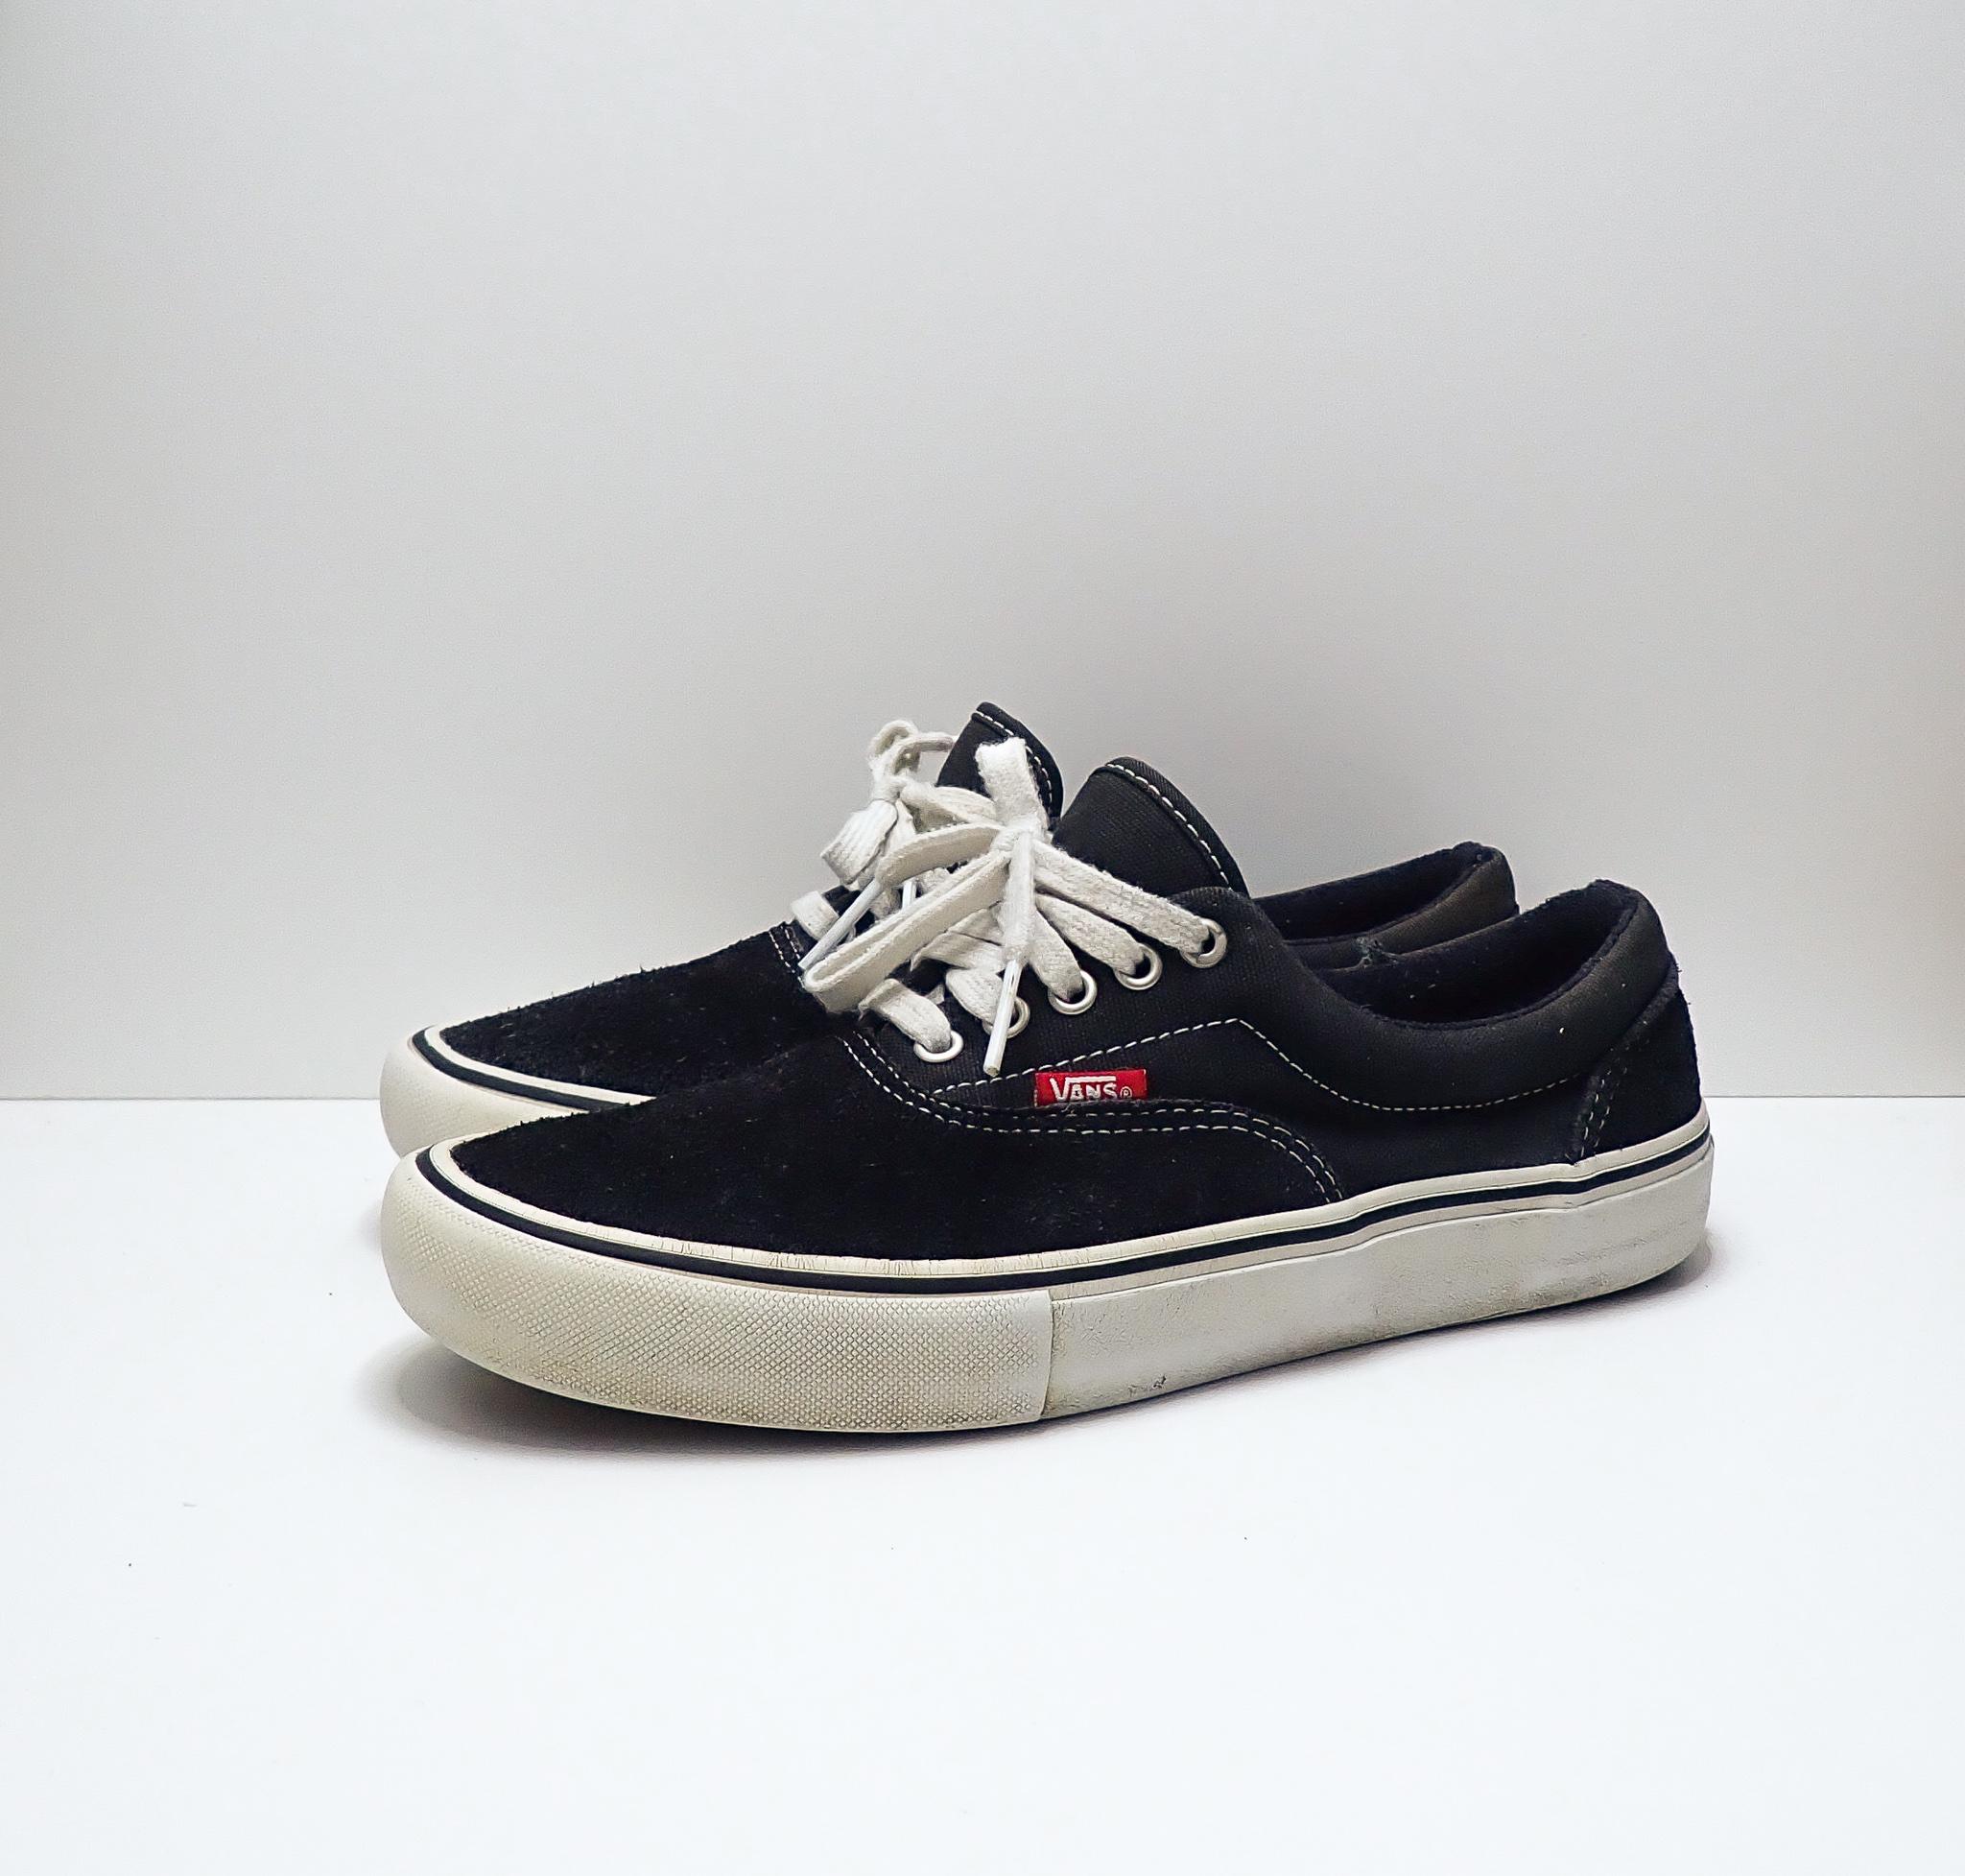 Vans Era Pro Skate